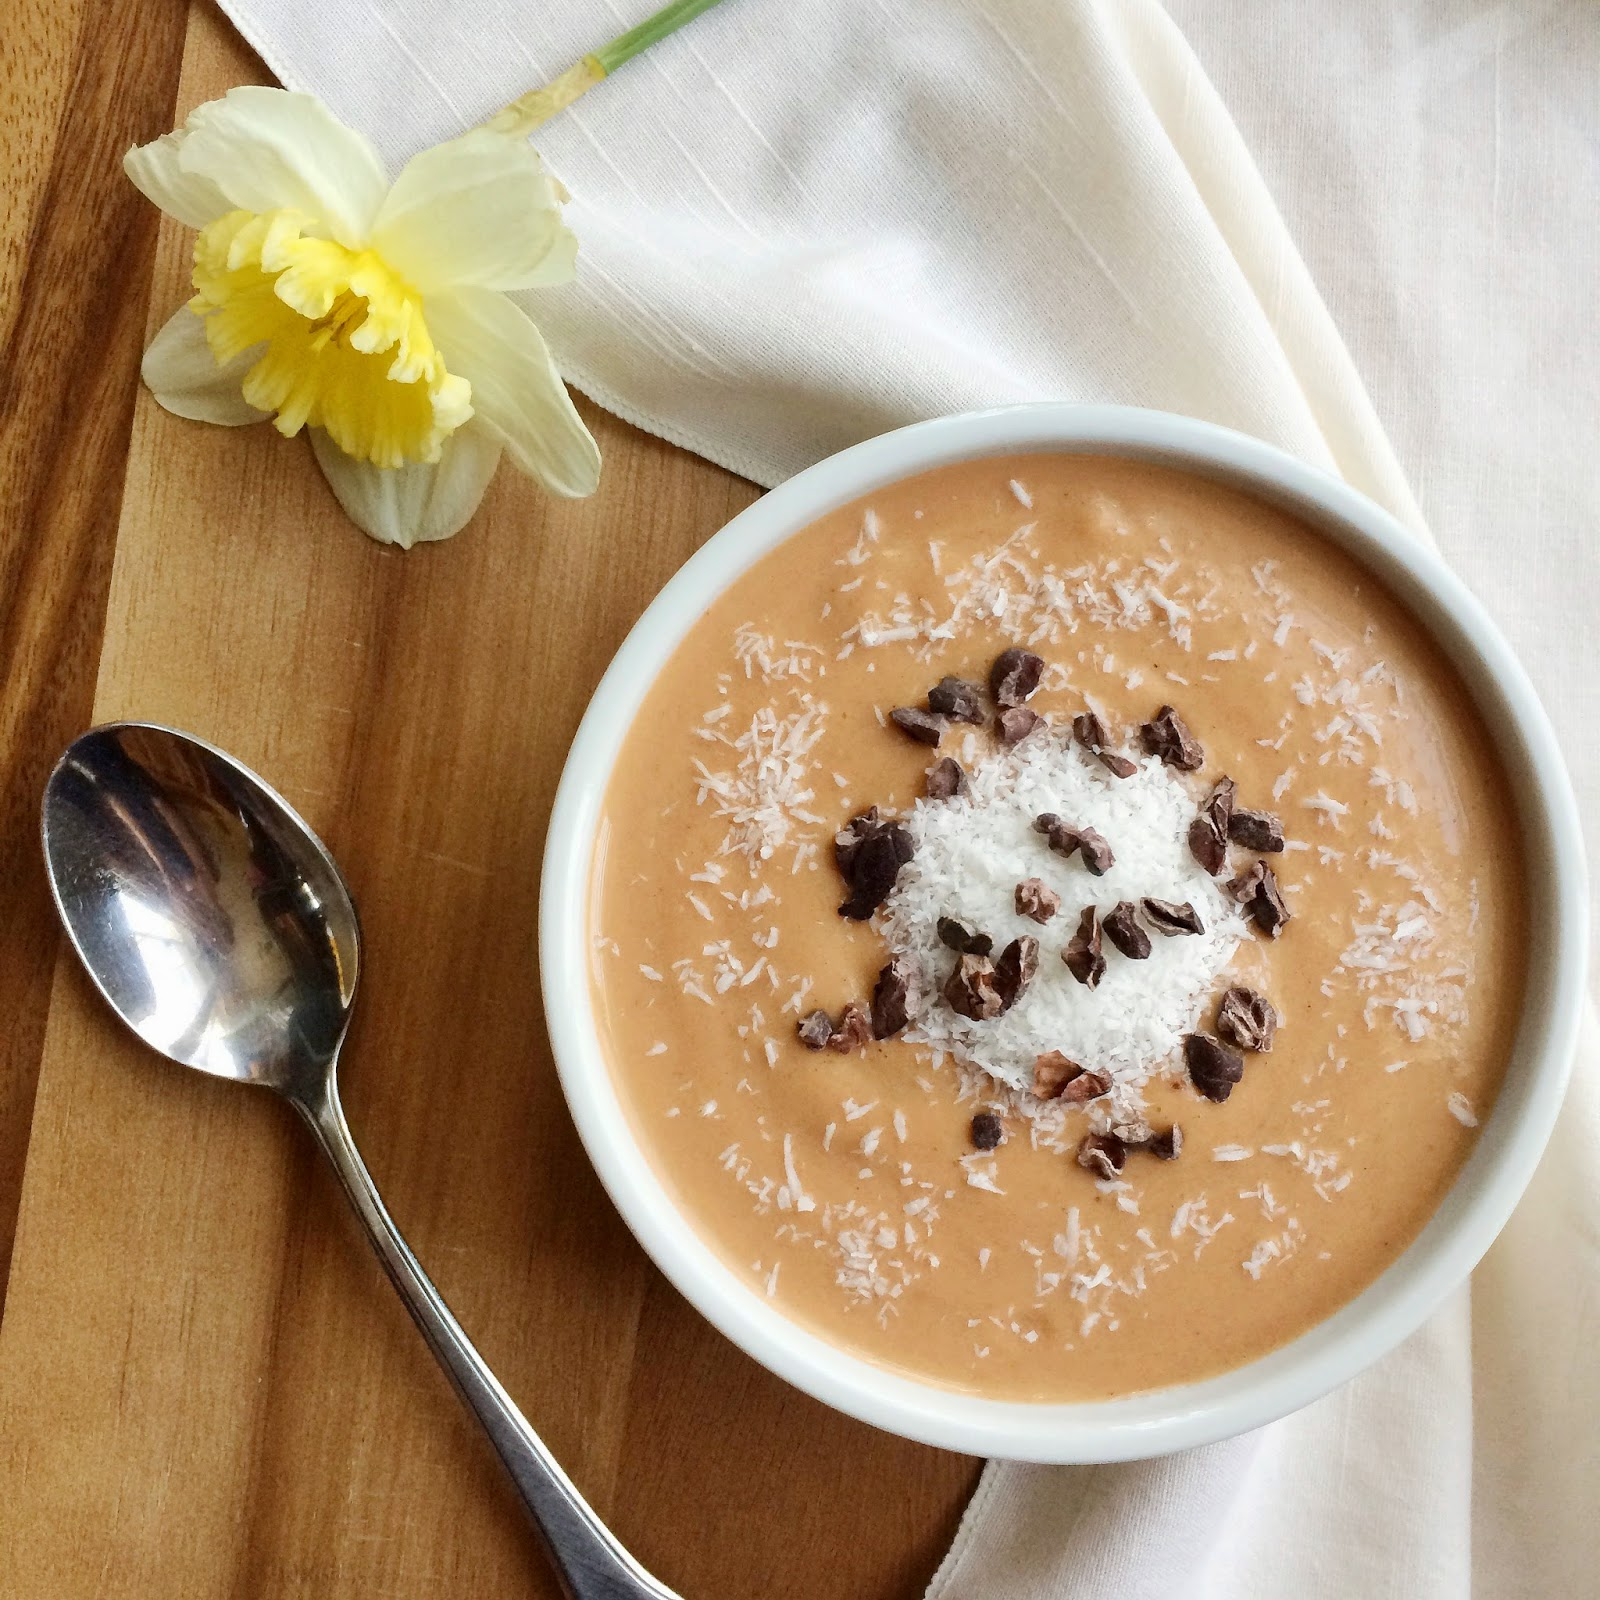 8. Carrot Cake Protein Smoothie